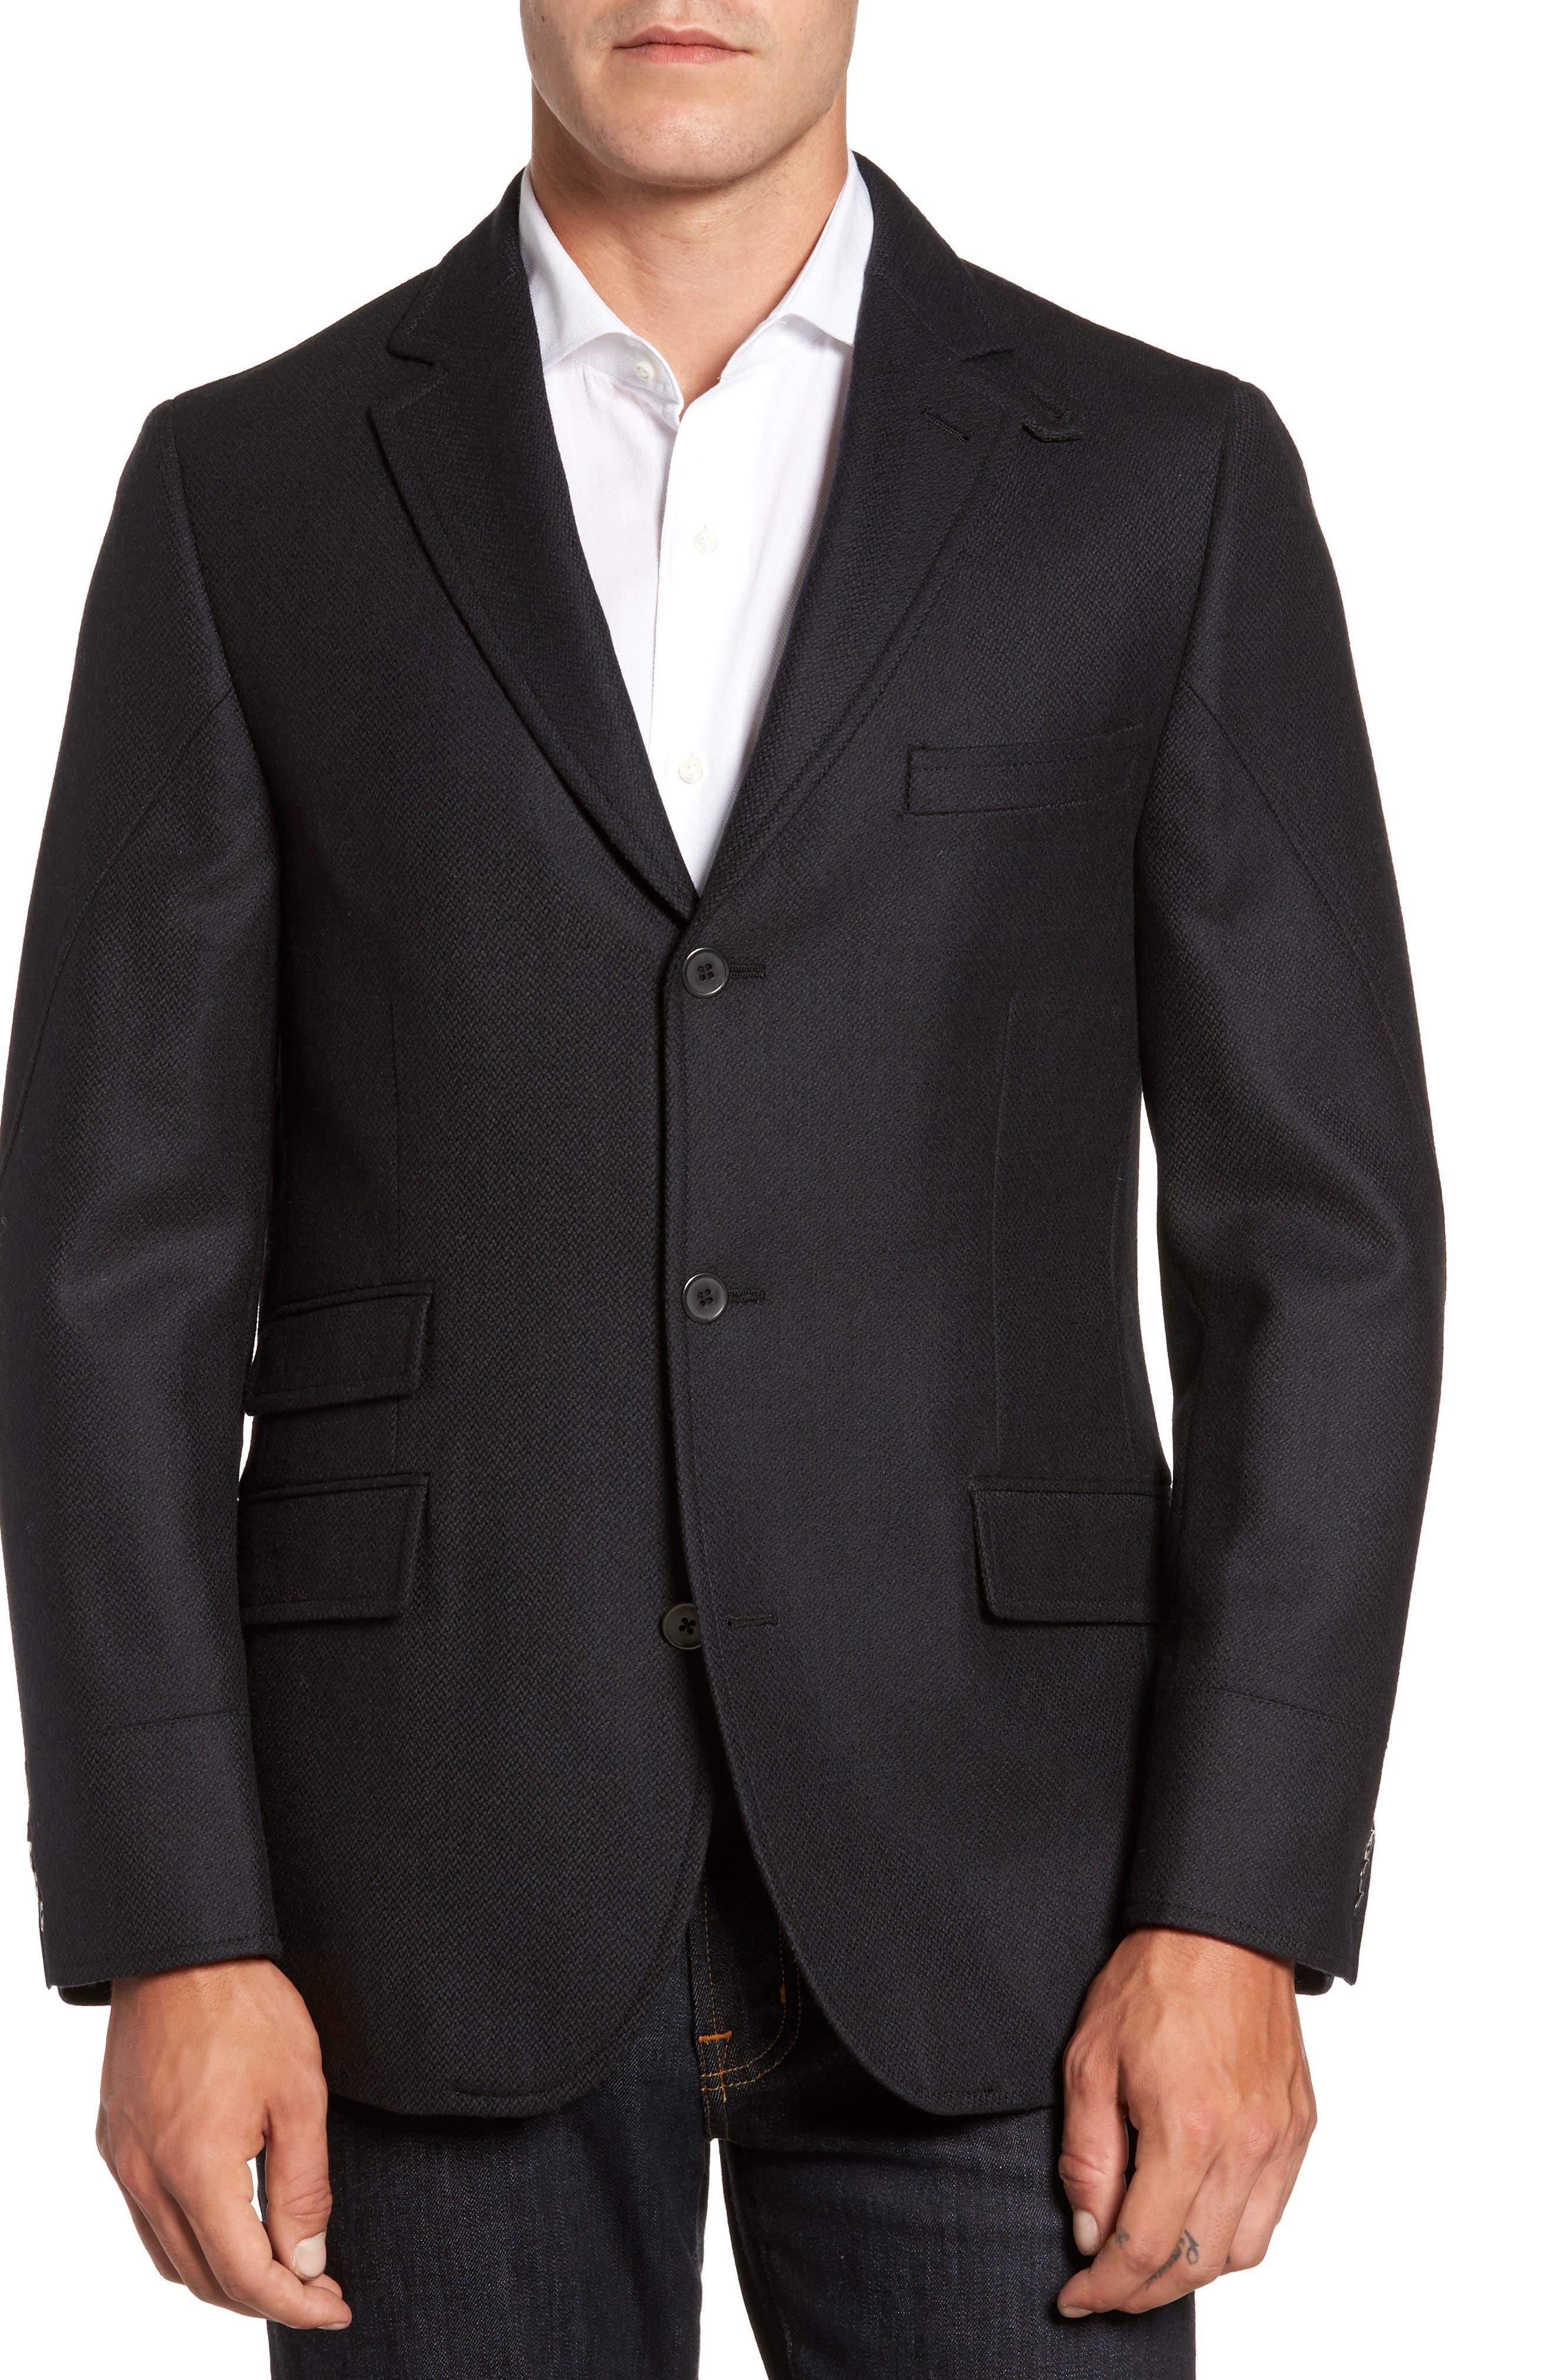 Classic Fit Wool & Cashmere Hybrid Coat,                             Alternate thumbnail 4, color,                             001